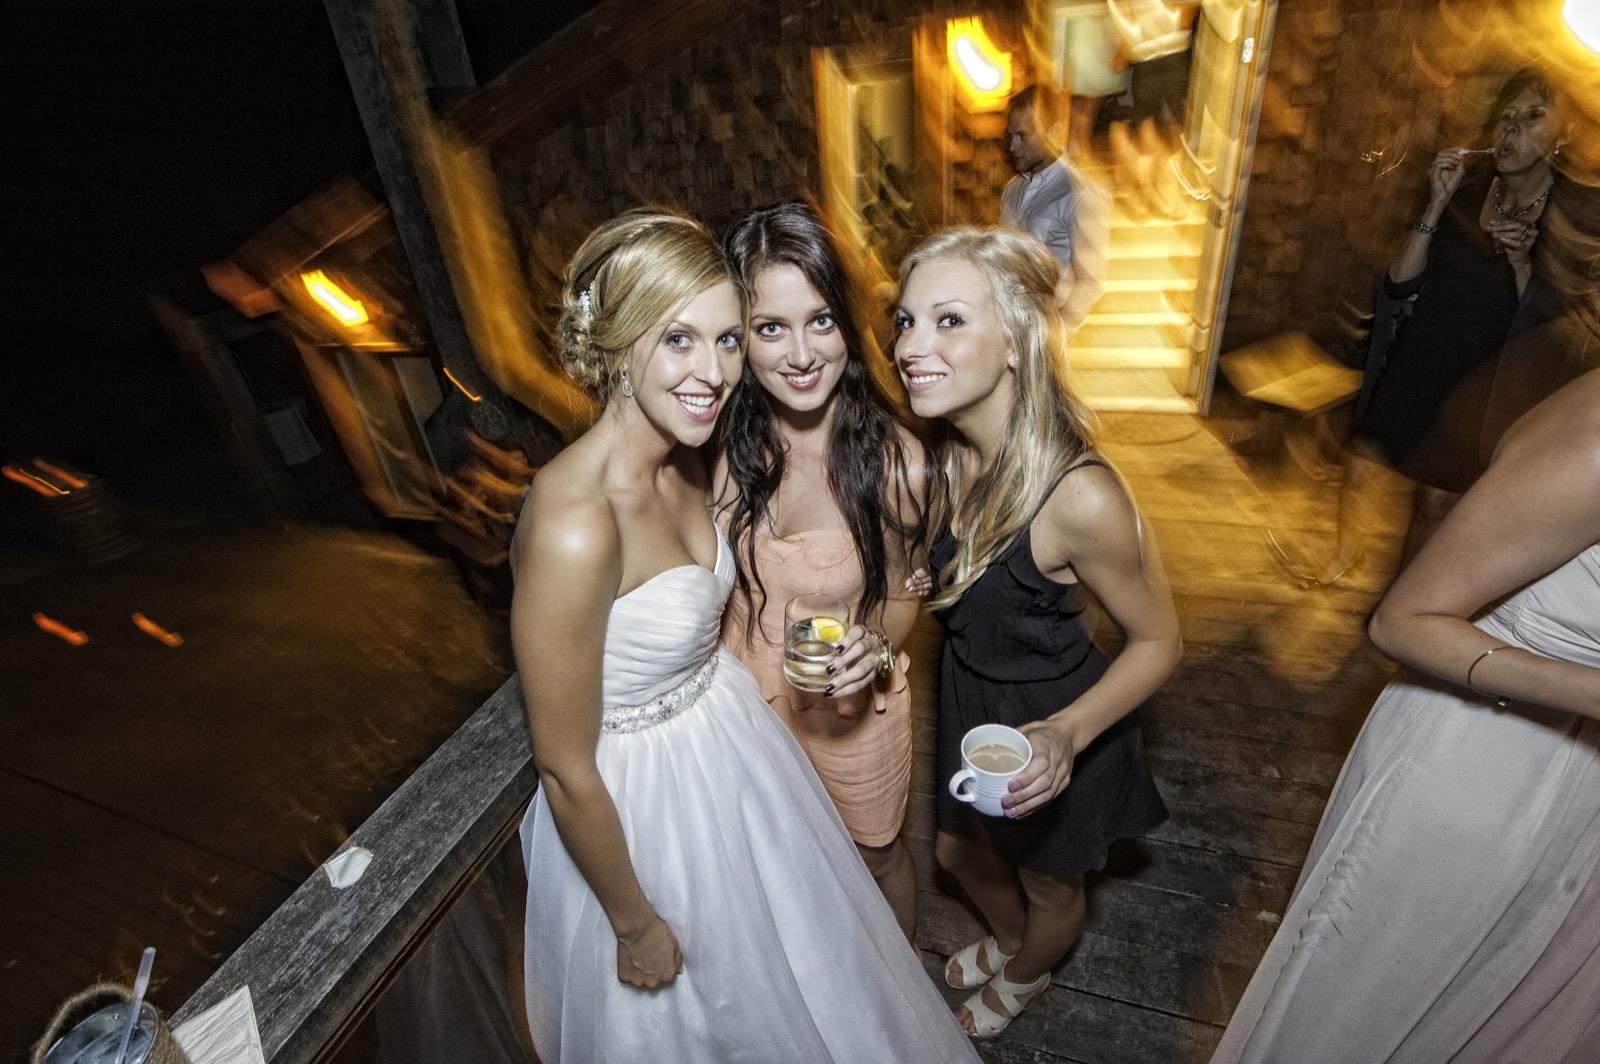 sooke-wedding-photographers-craidelonna-oceanedge-lodge-wedding-91.jpg